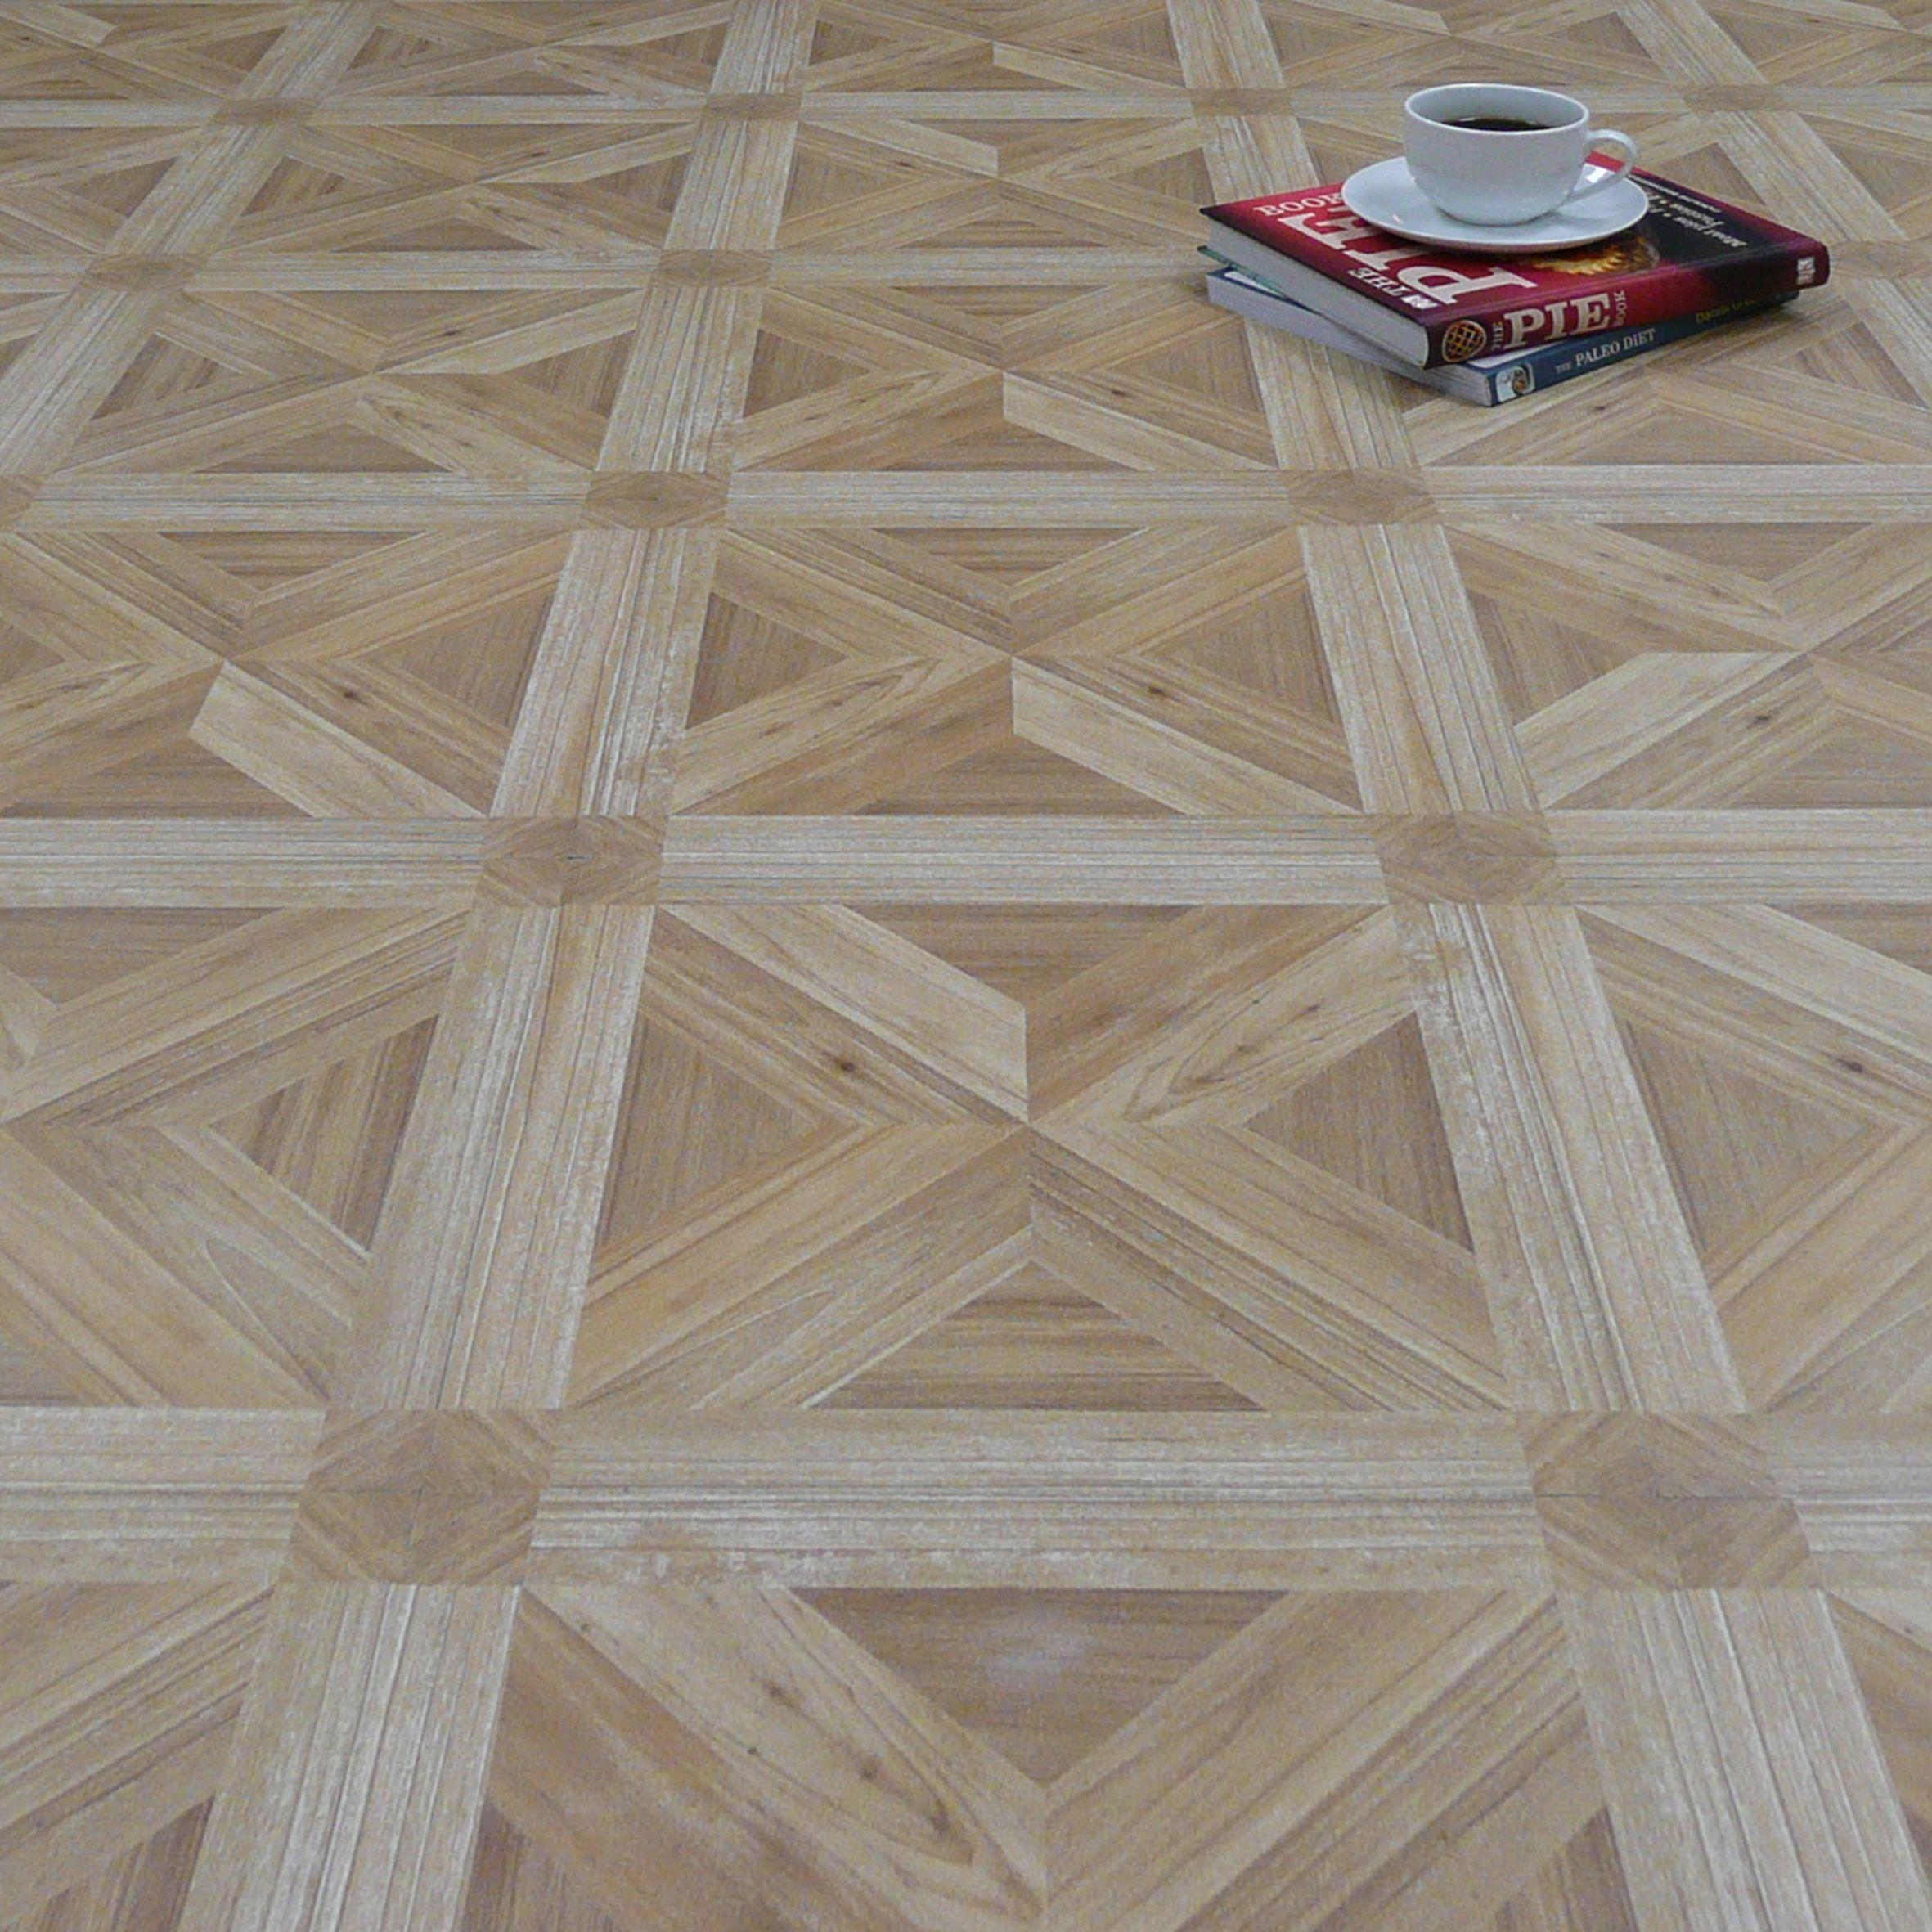 Vinyl flooring buying guide Help Ideas DIY at BQ